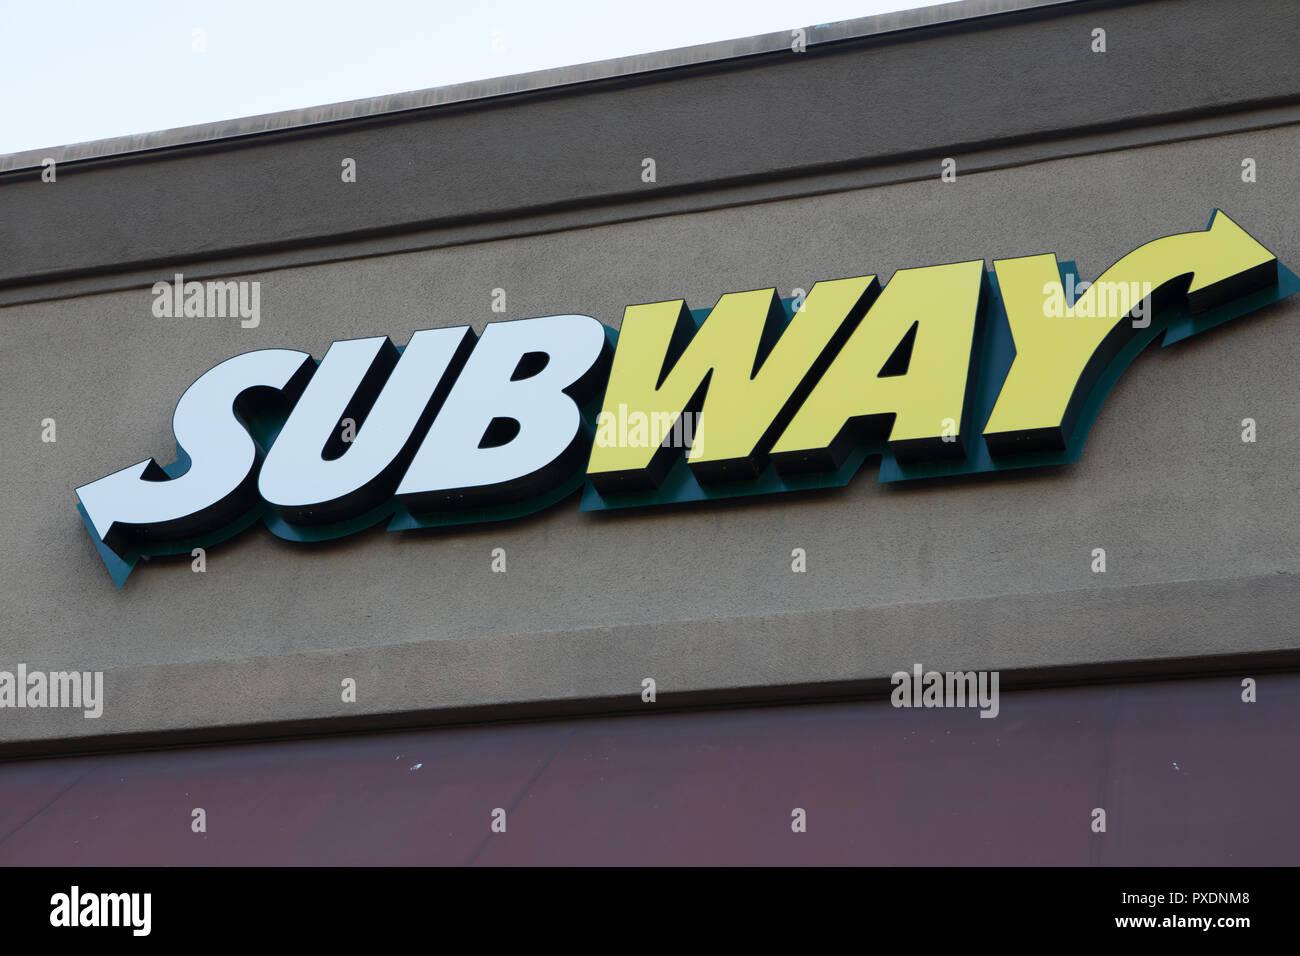 Subway sandwich company  exterior sign and logo on a store in Santa Ana, California,USA - Stock Image